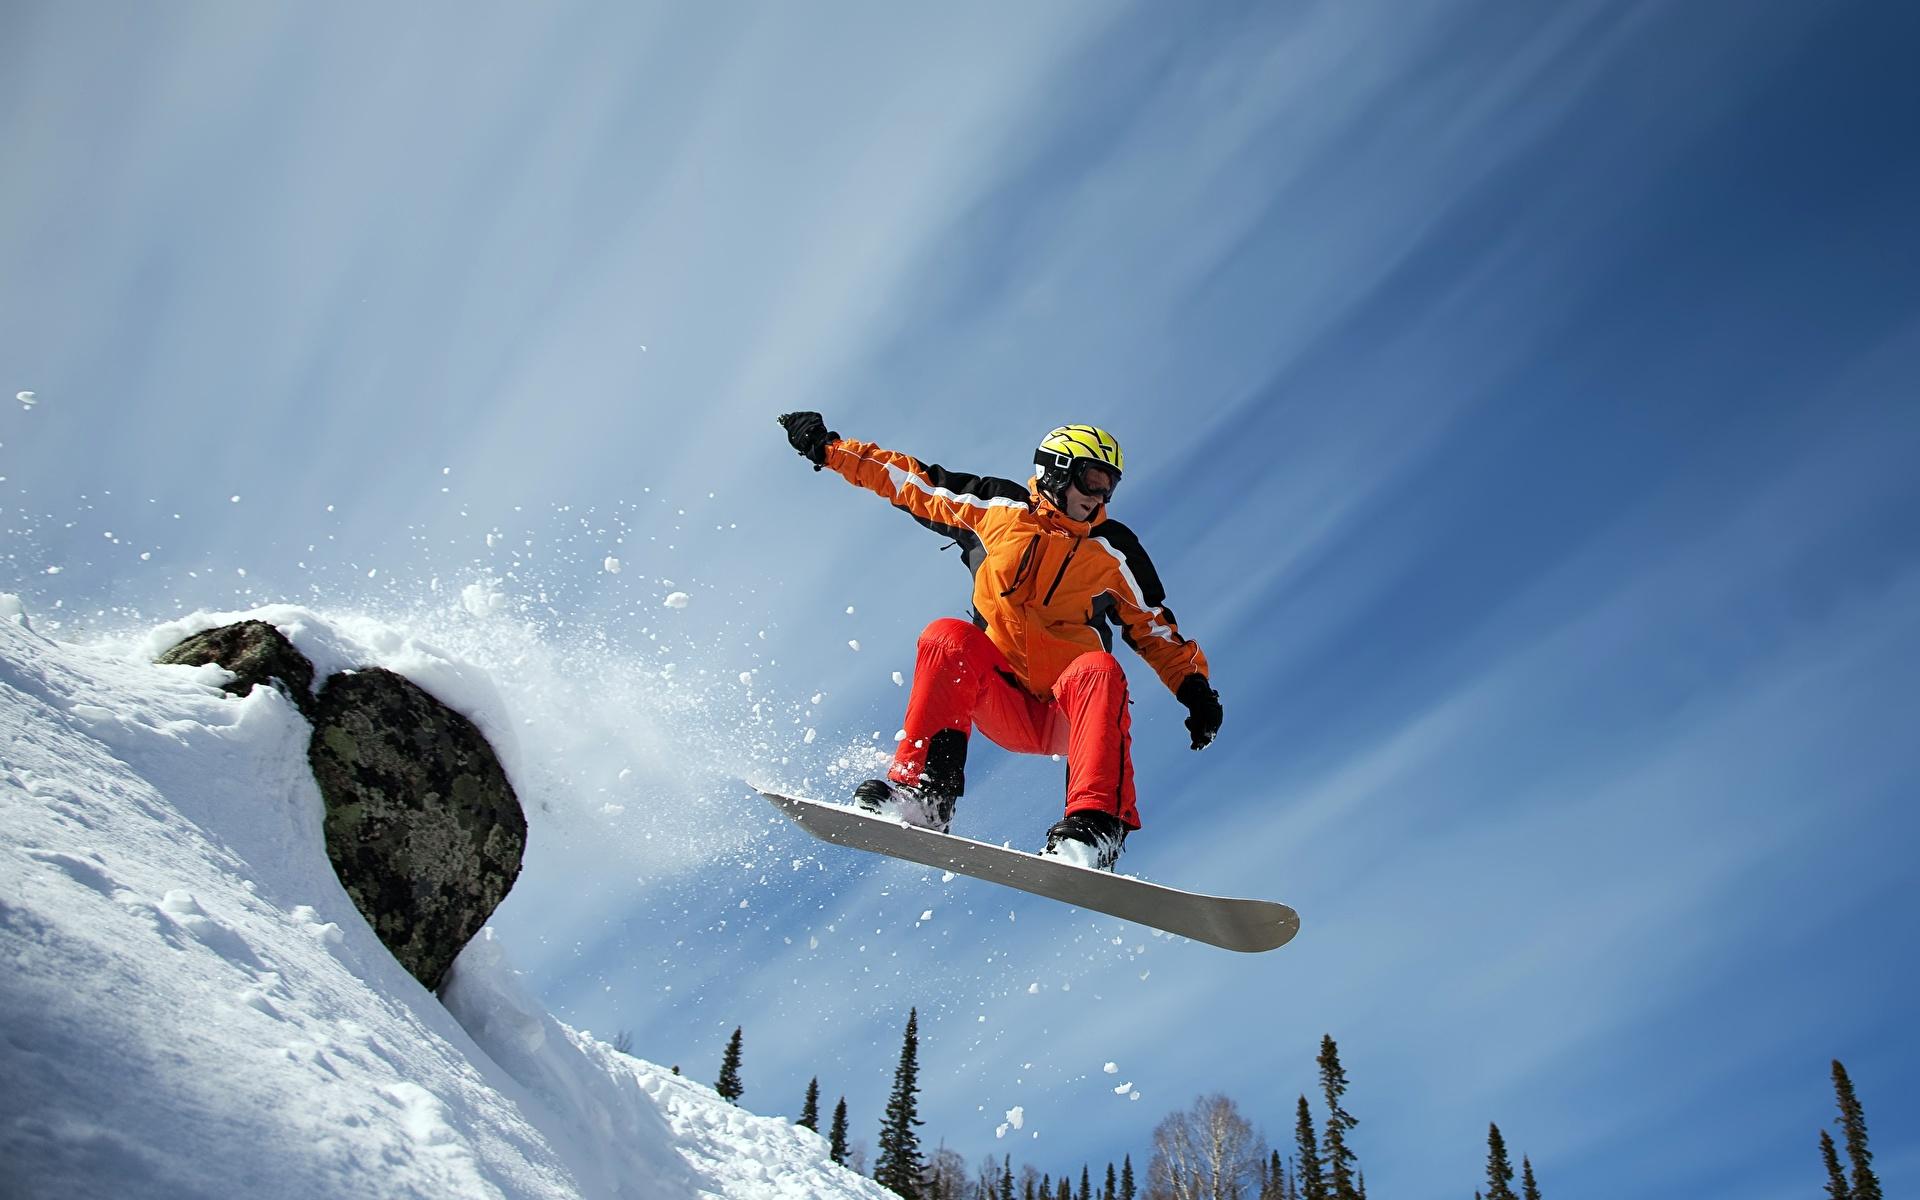 Сноуборд - Центр спортивной подготовки Республики Татарстан